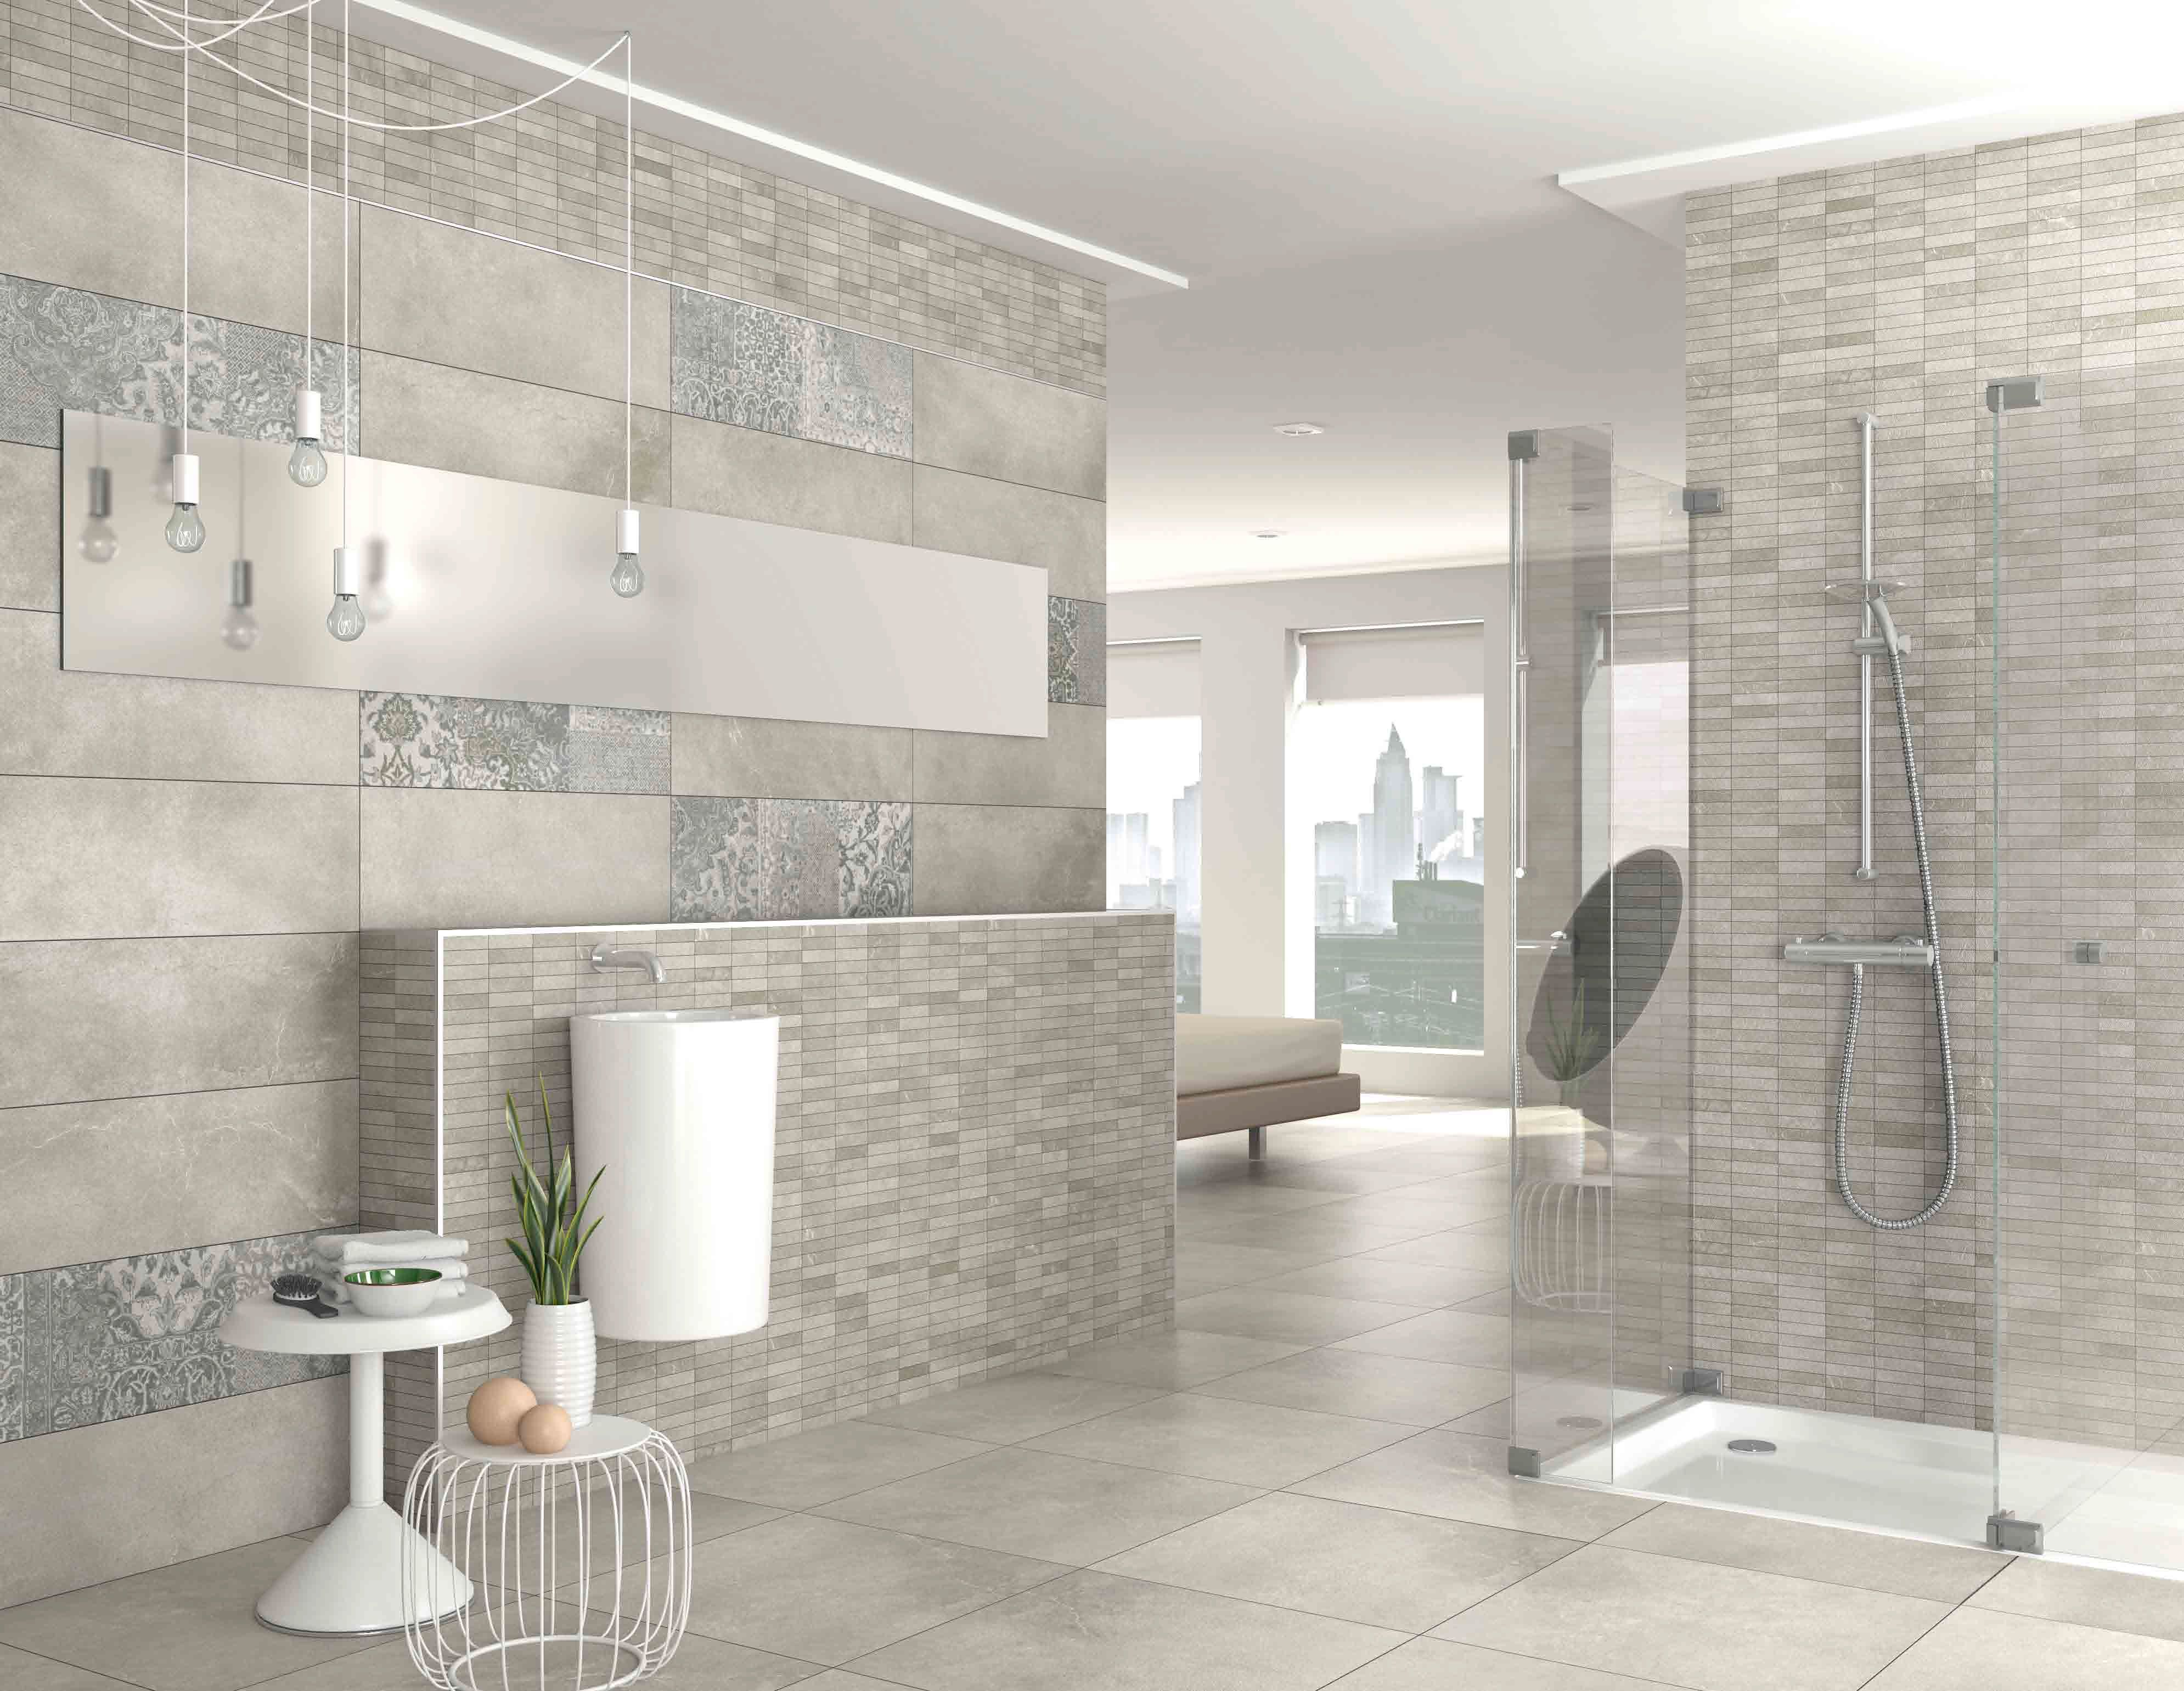 Carrelage Mural Salle De Bain Frazzi ~  pingl par eugenio medeiros sur shower room pinterest